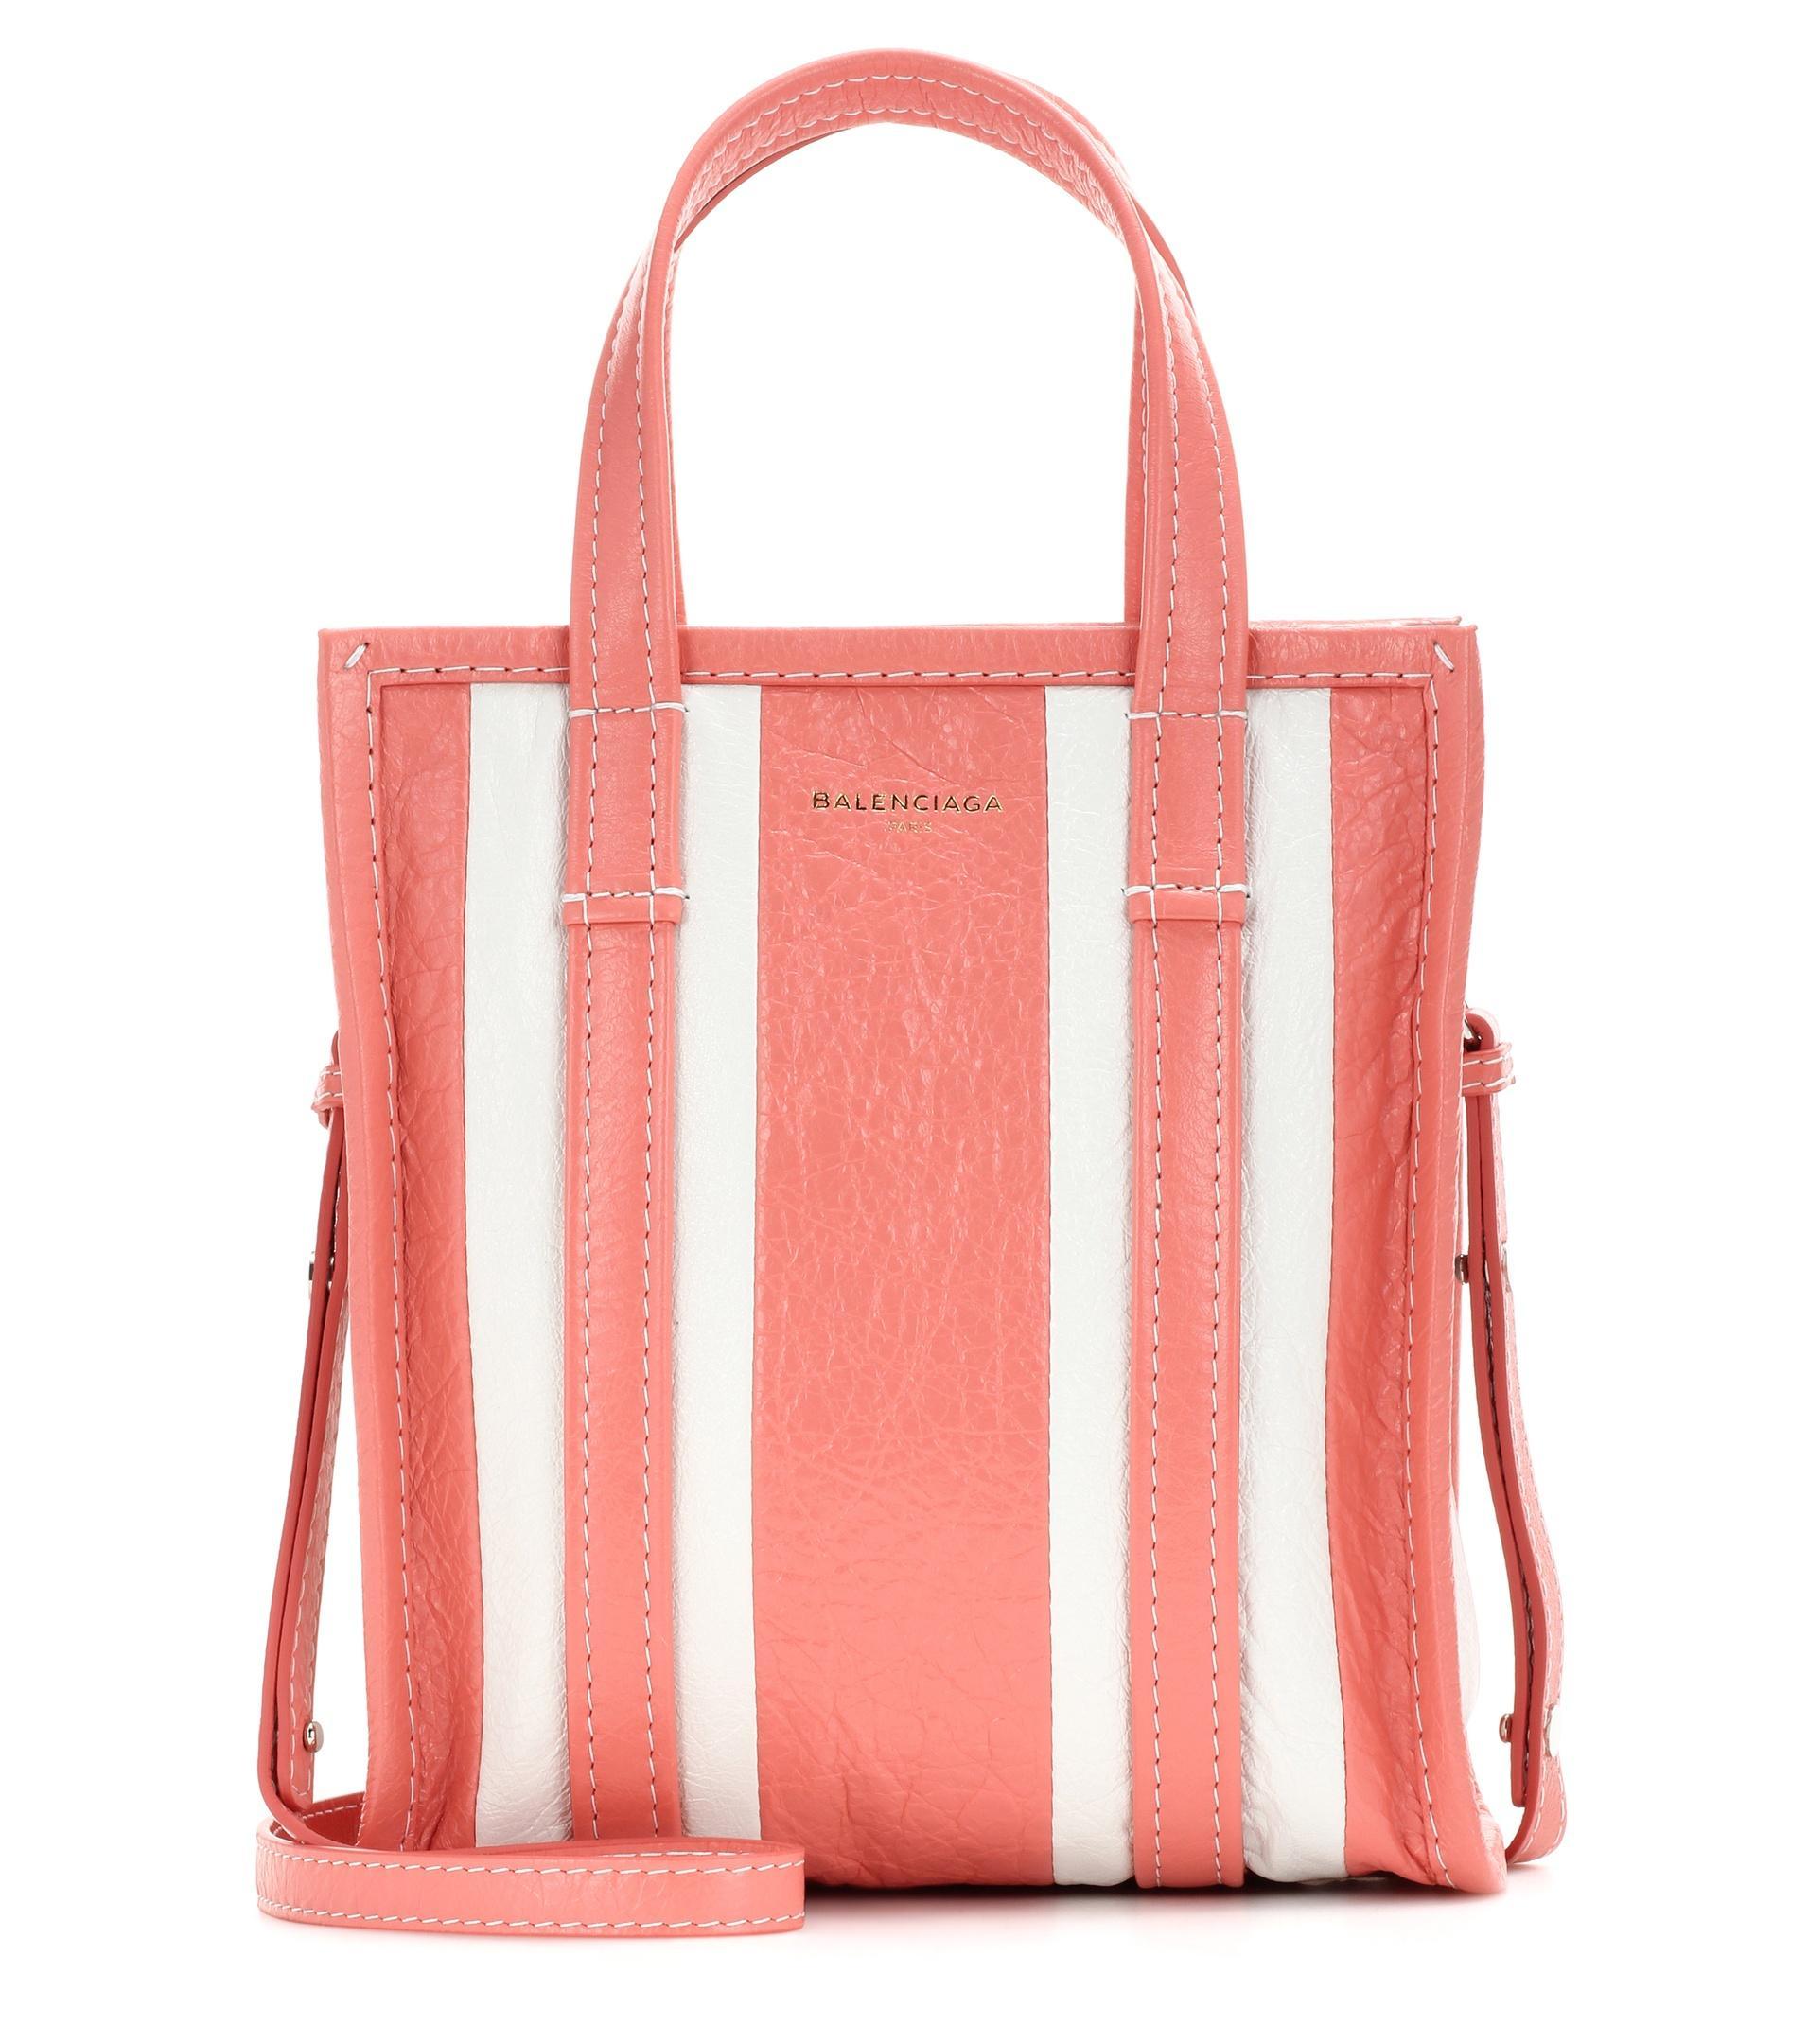 908435b58 Balenciaga Bazar Shopper XS Striped Leather Tote Bag in Pink - Lyst